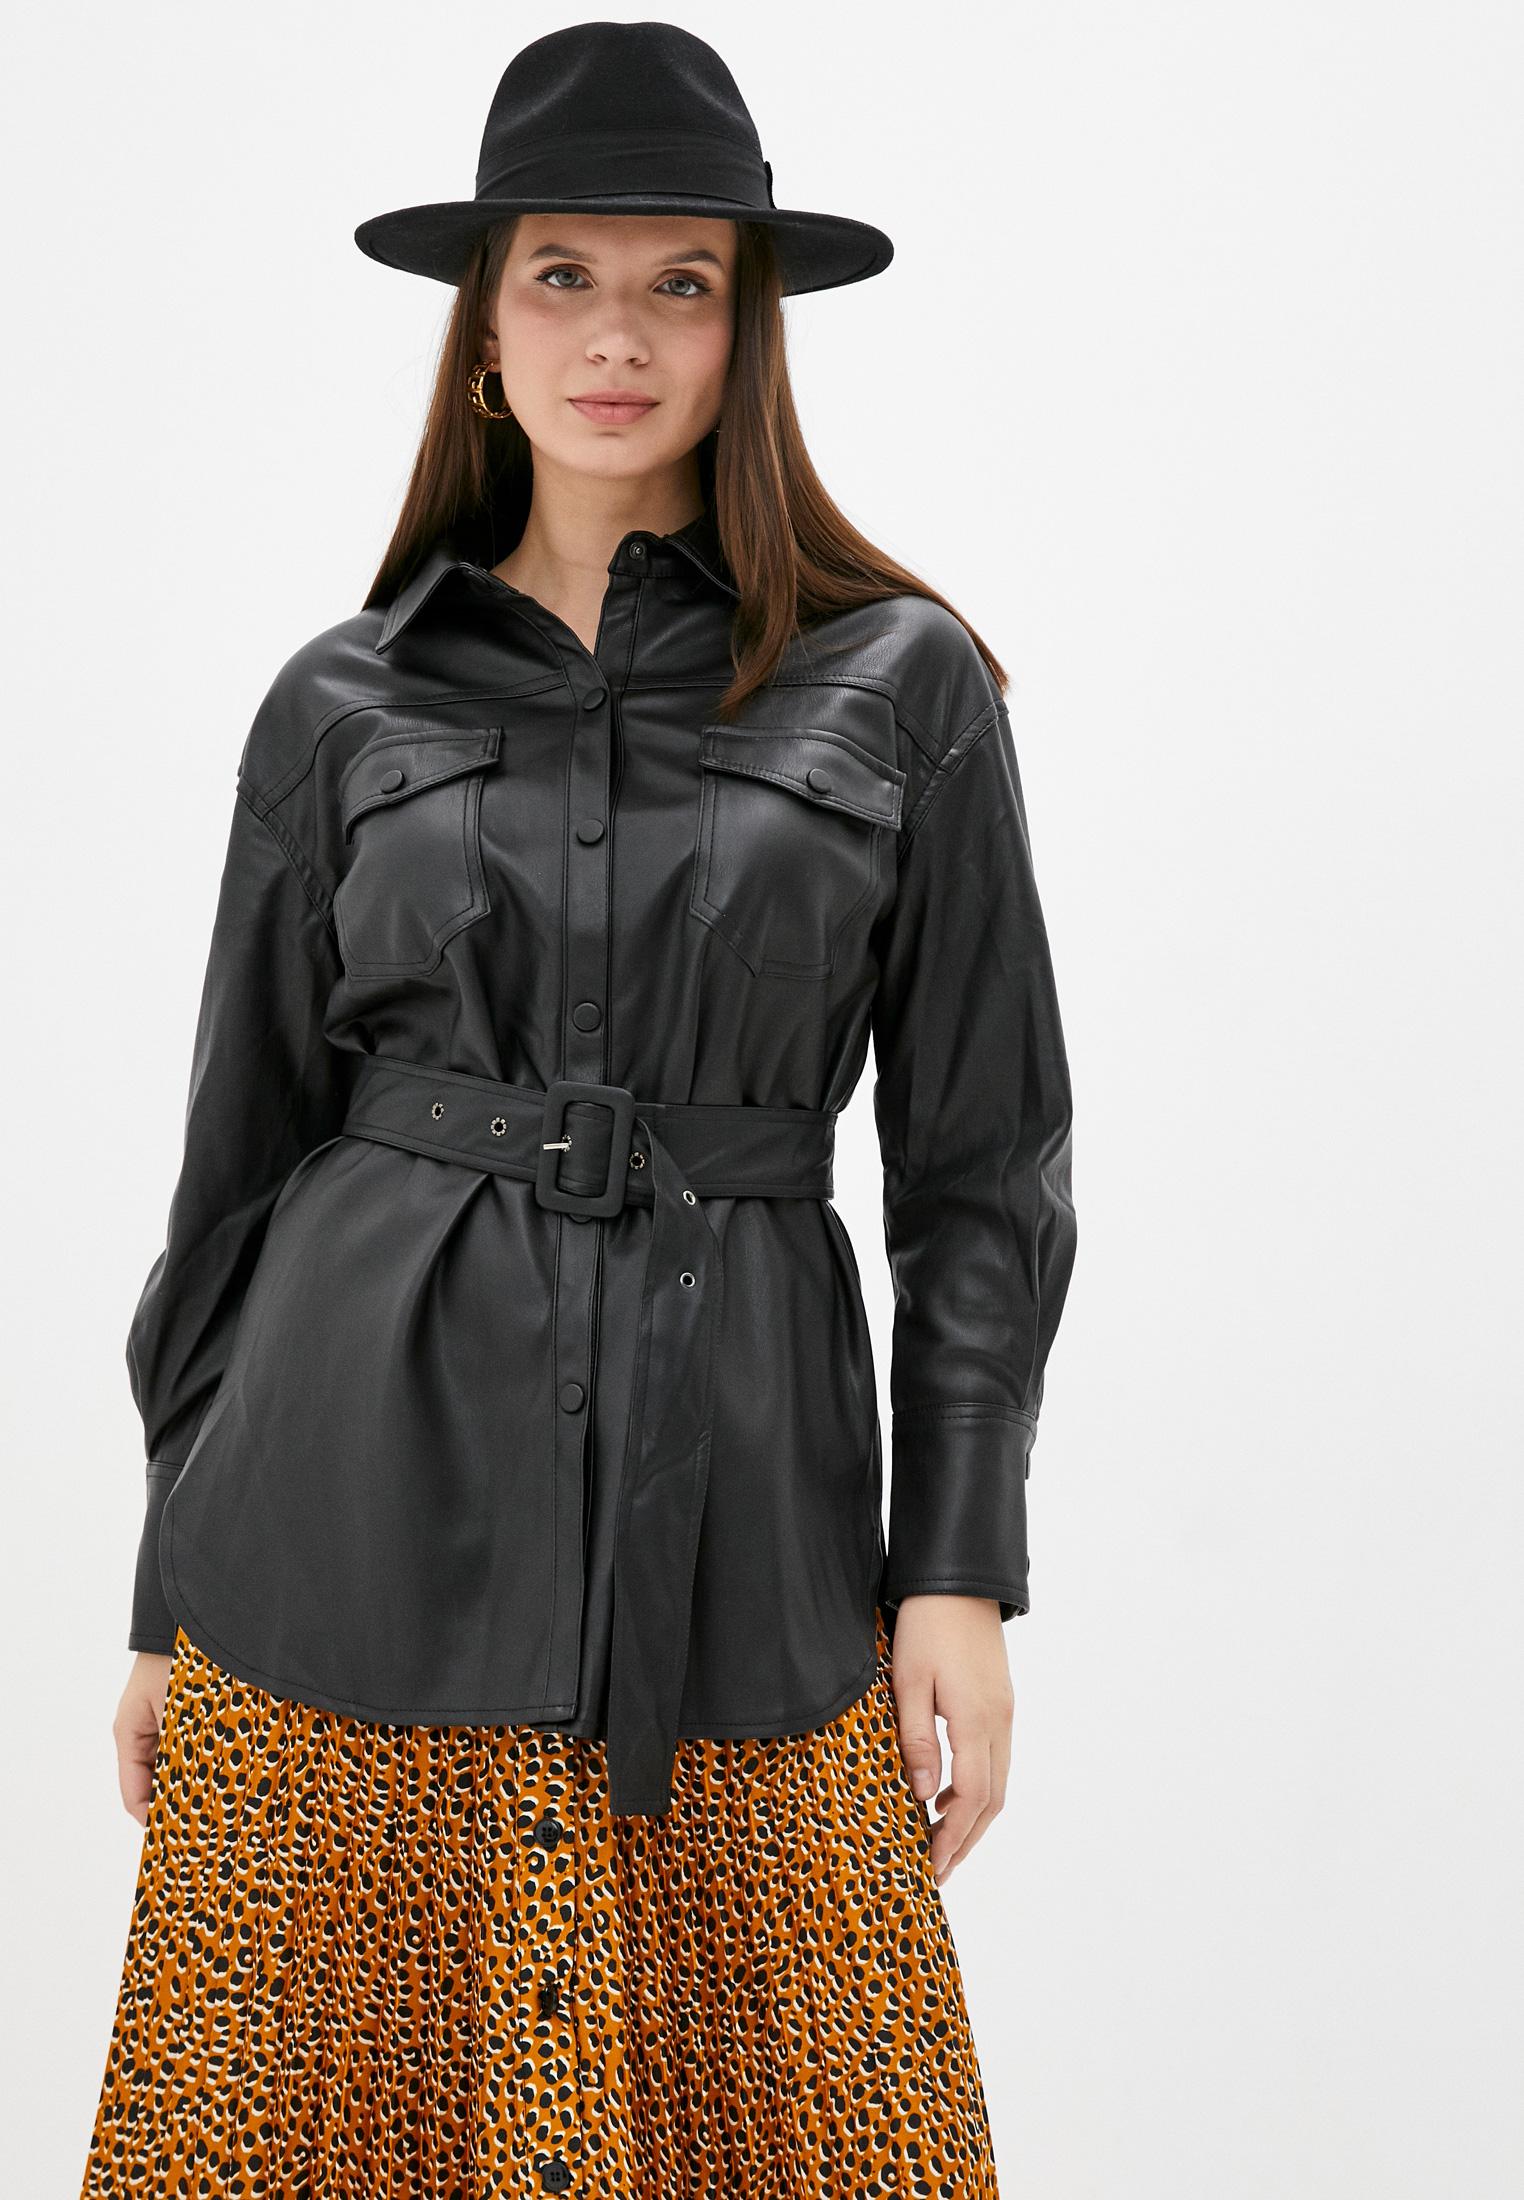 Женские рубашки с длинным рукавом Francesca Peretti Рубашка Francesca Peretti